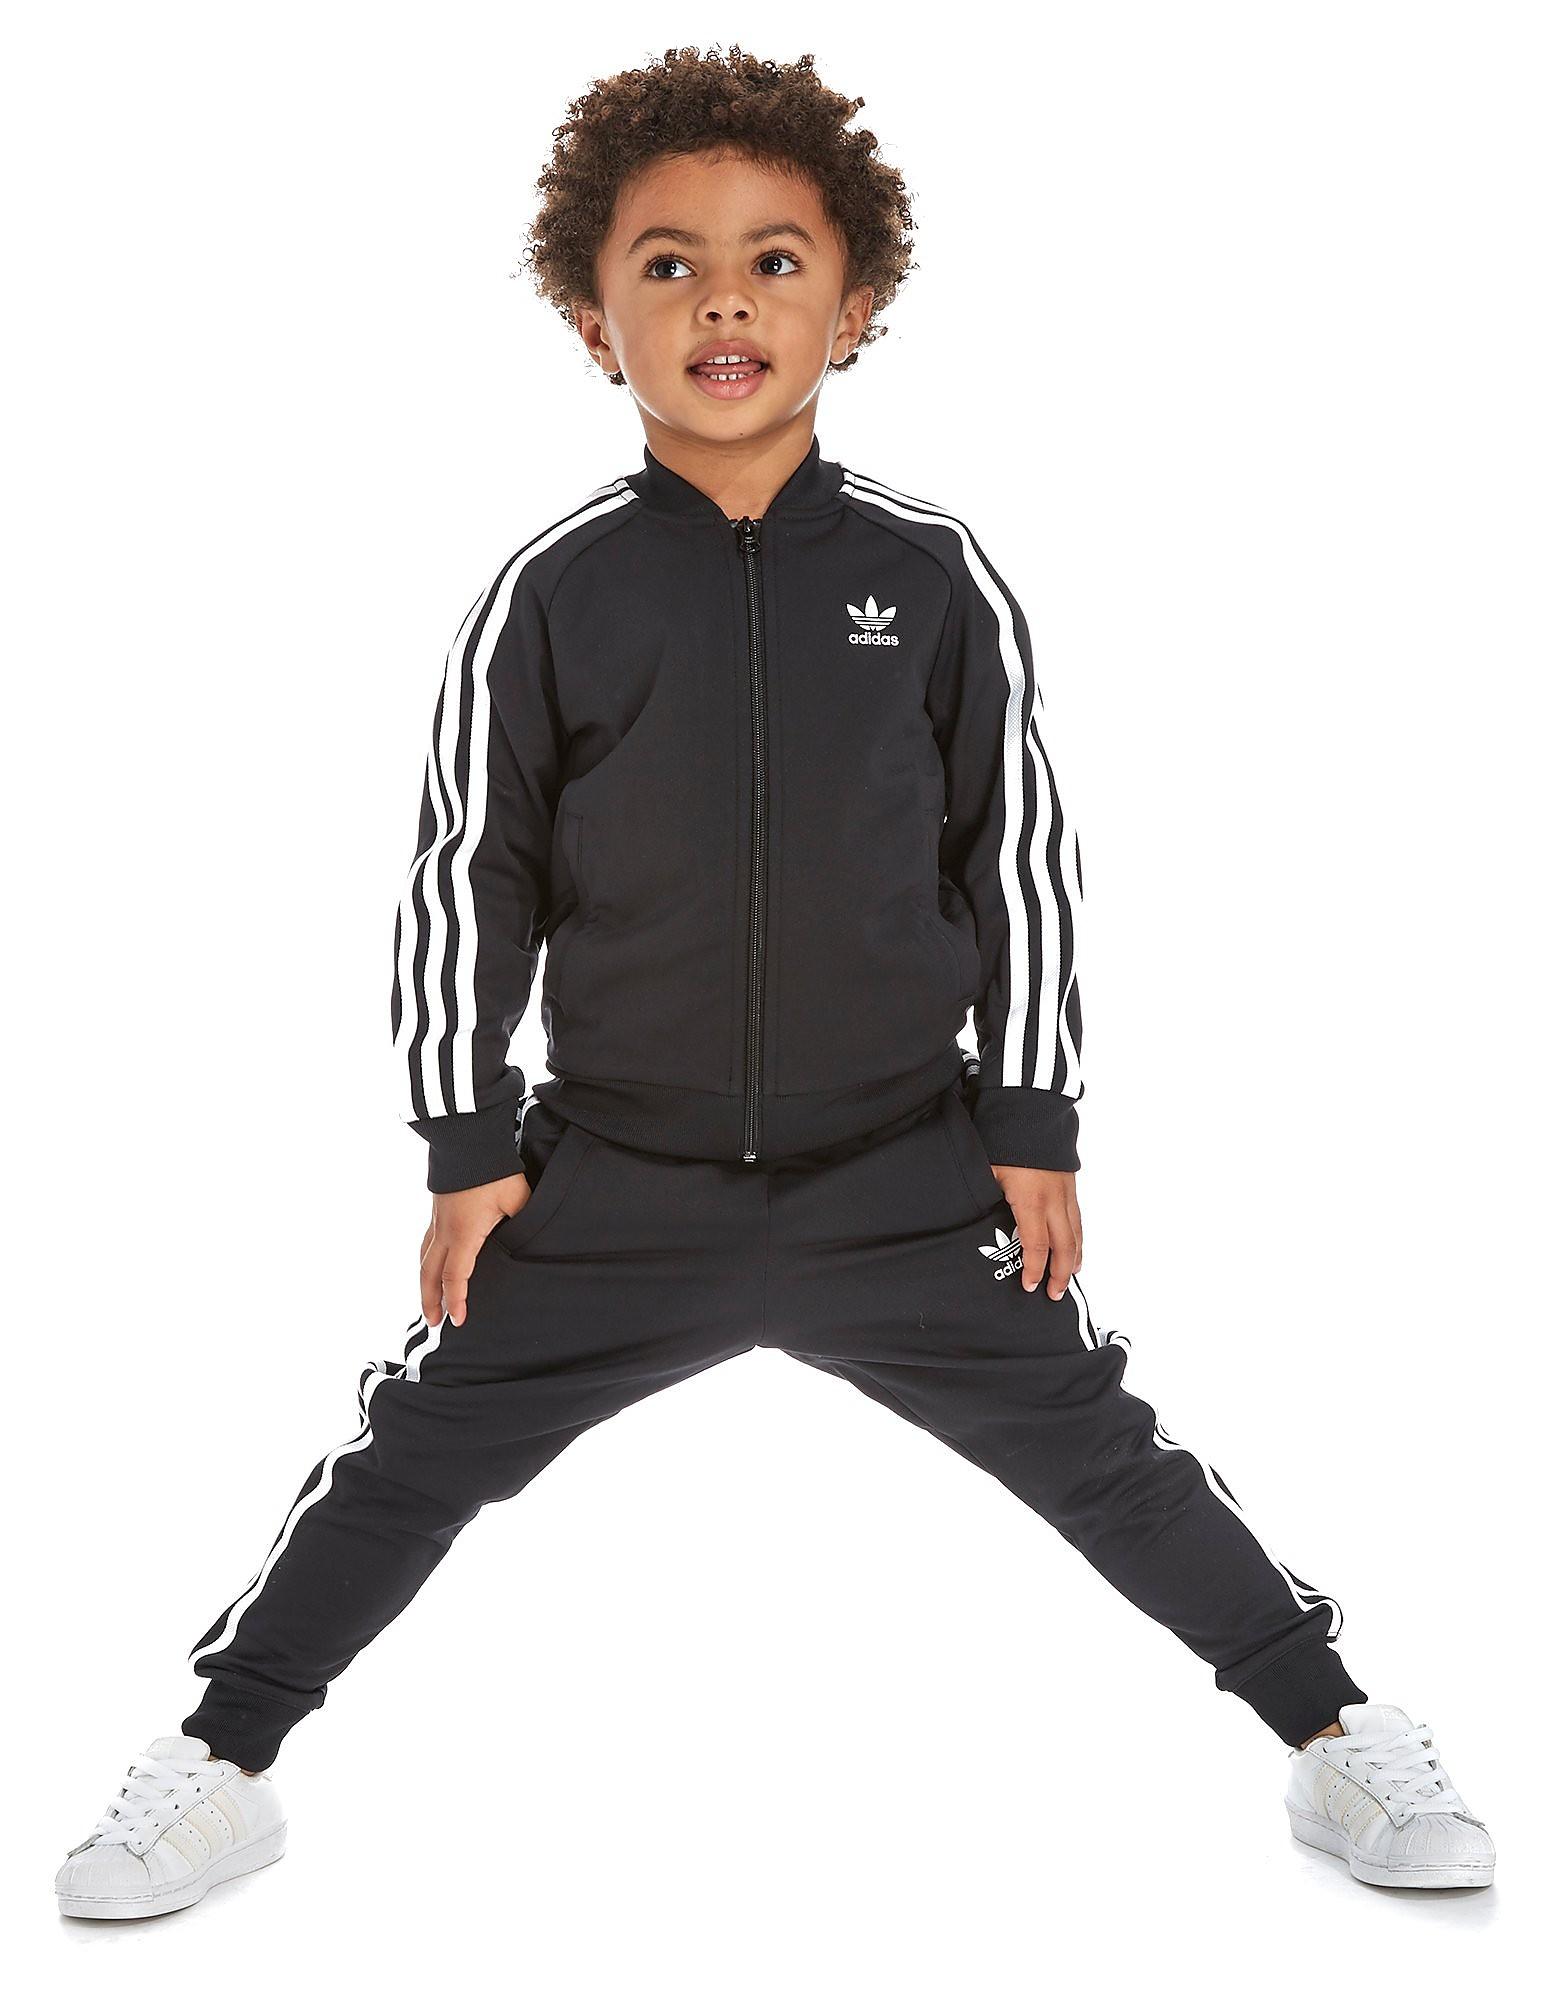 adidas Originals Superstar Tracksuit Children